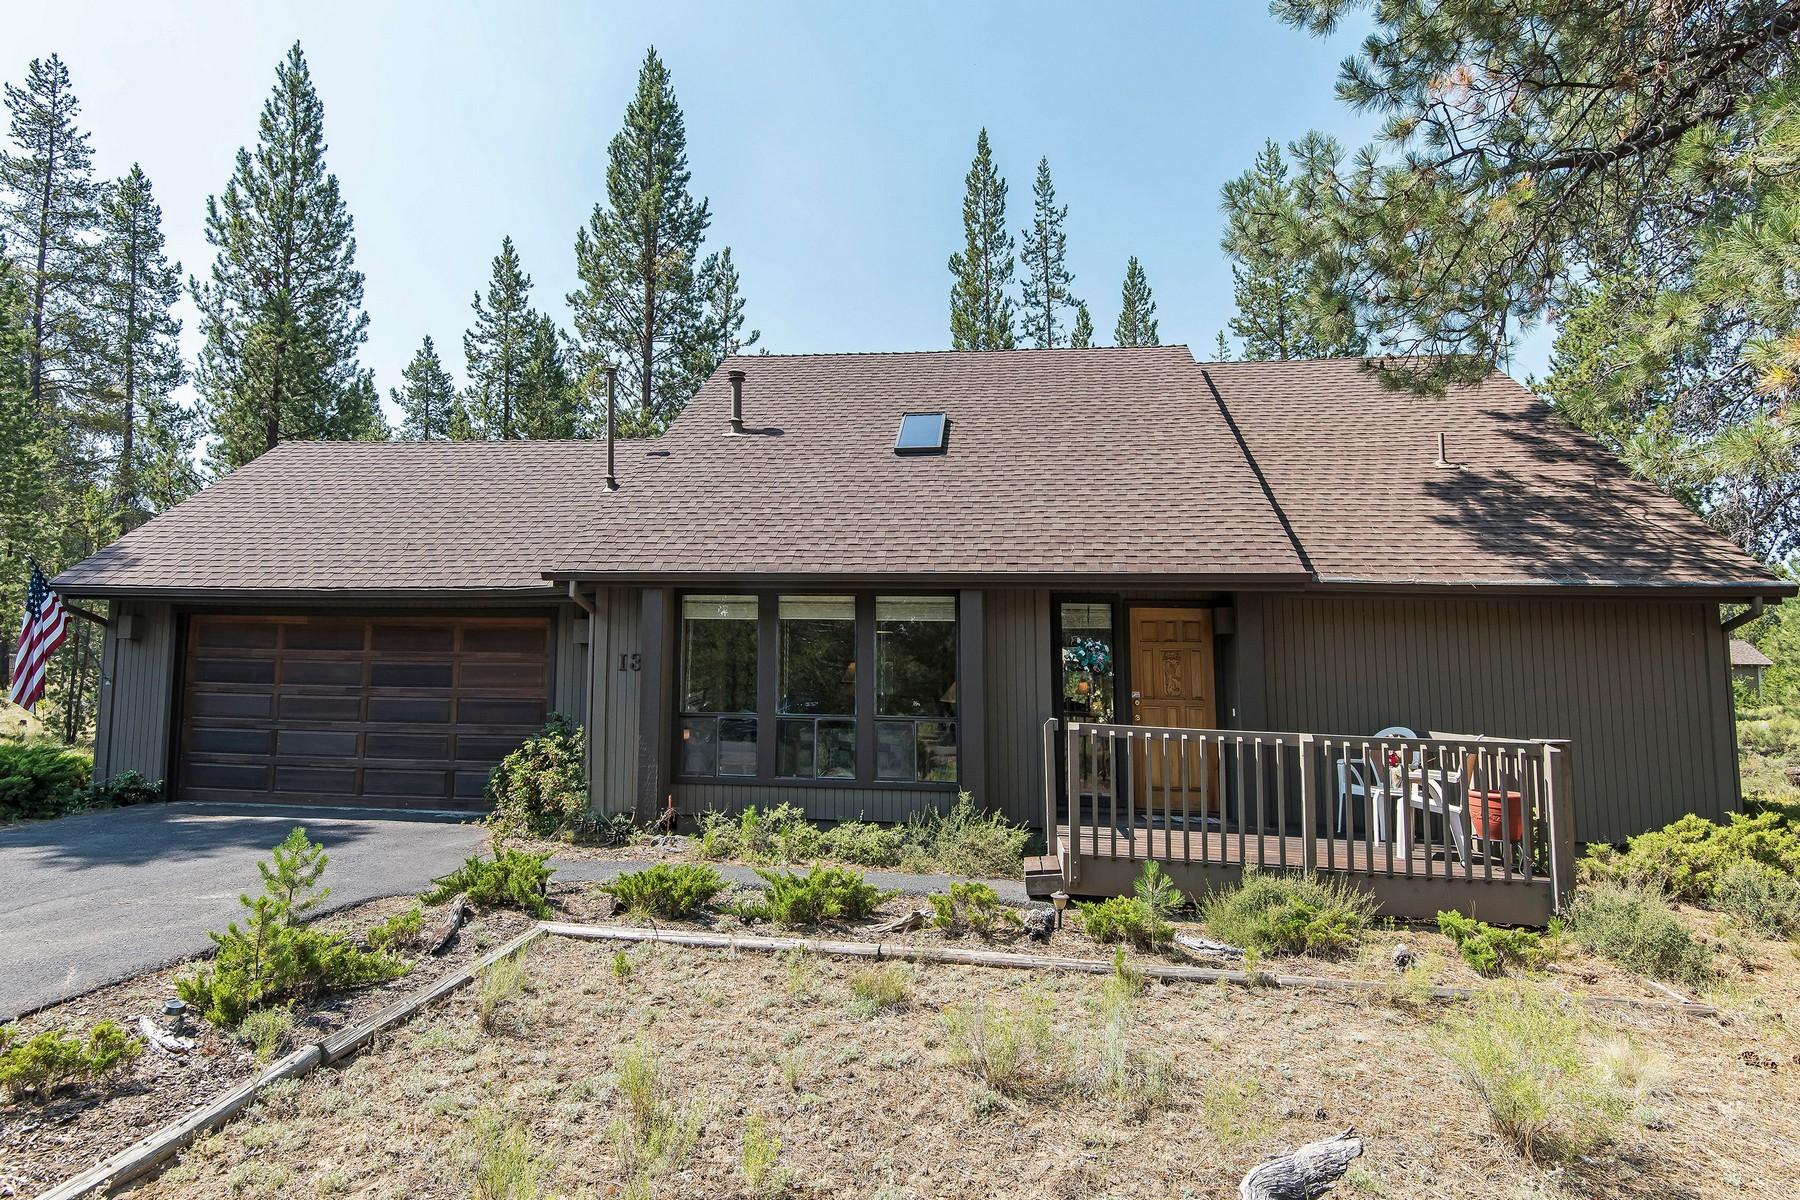 Other Residential Homes για την Πώληση στο 17651 Klamath Lane 13 Sunriver, OR 97707 Sunriver, Ορεγκον 97707 Ηνωμένες Πολιτείες